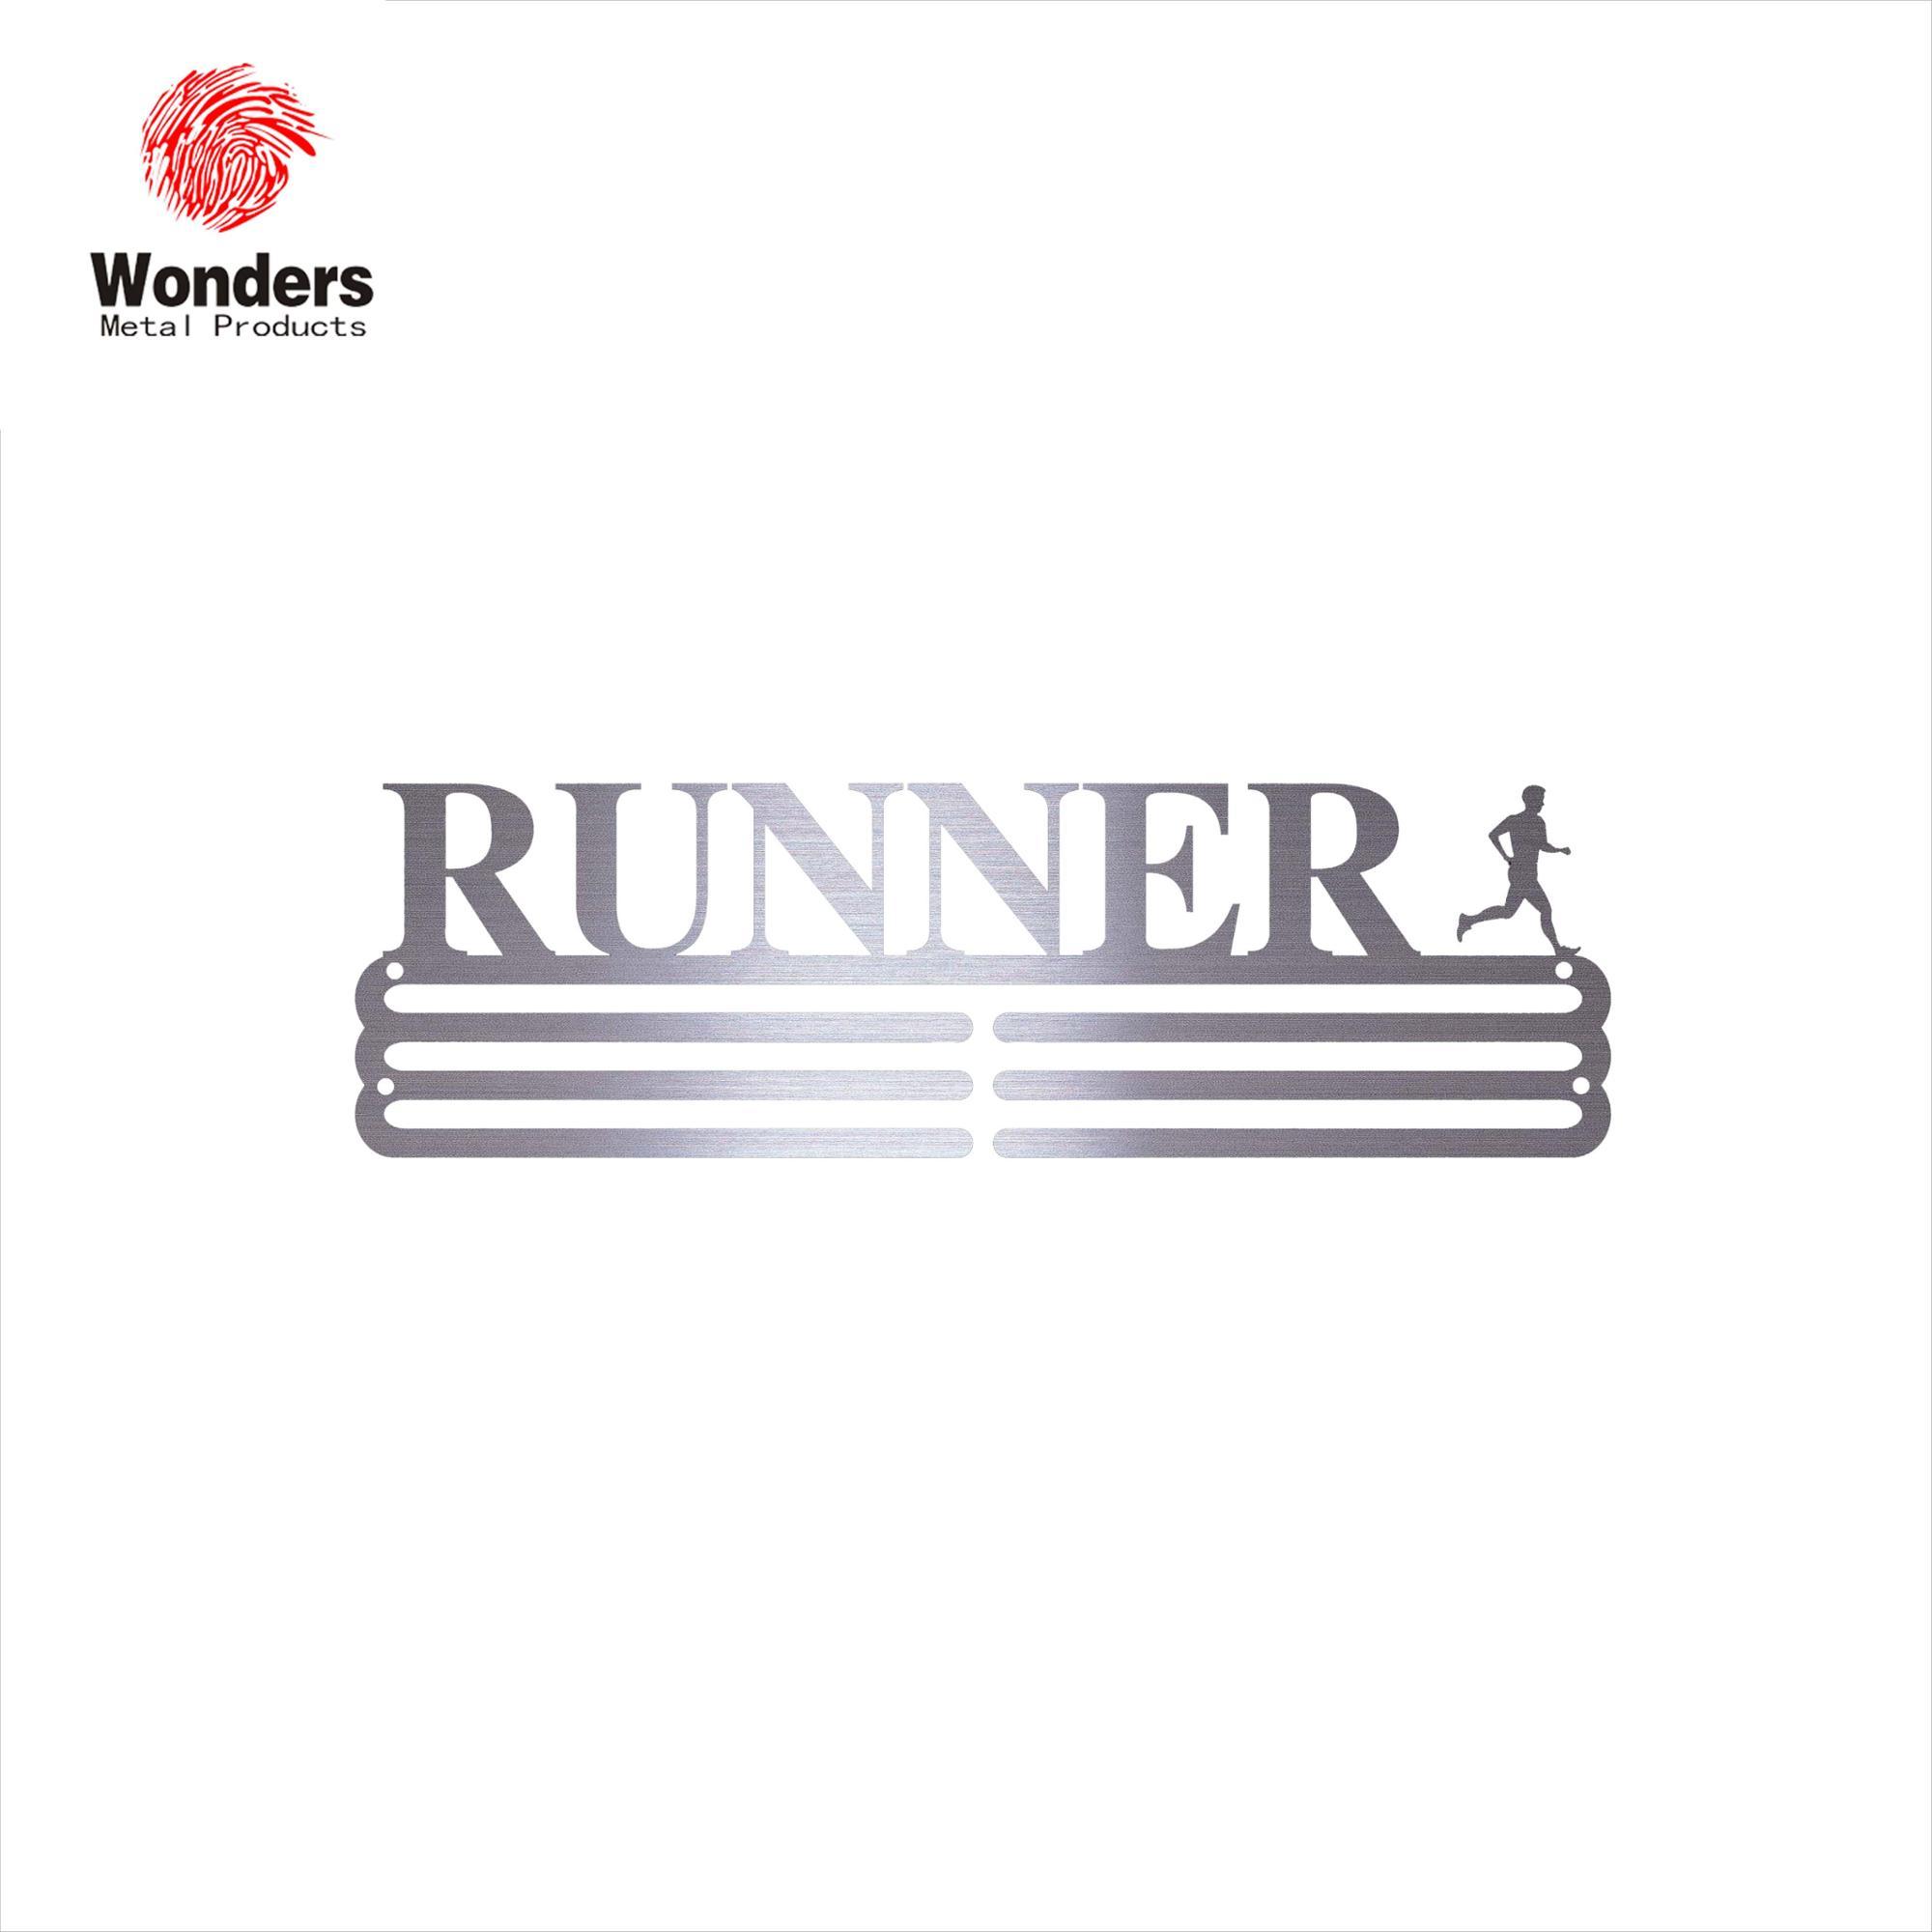 Professional Design Medal Hooks For Runners Medal Display